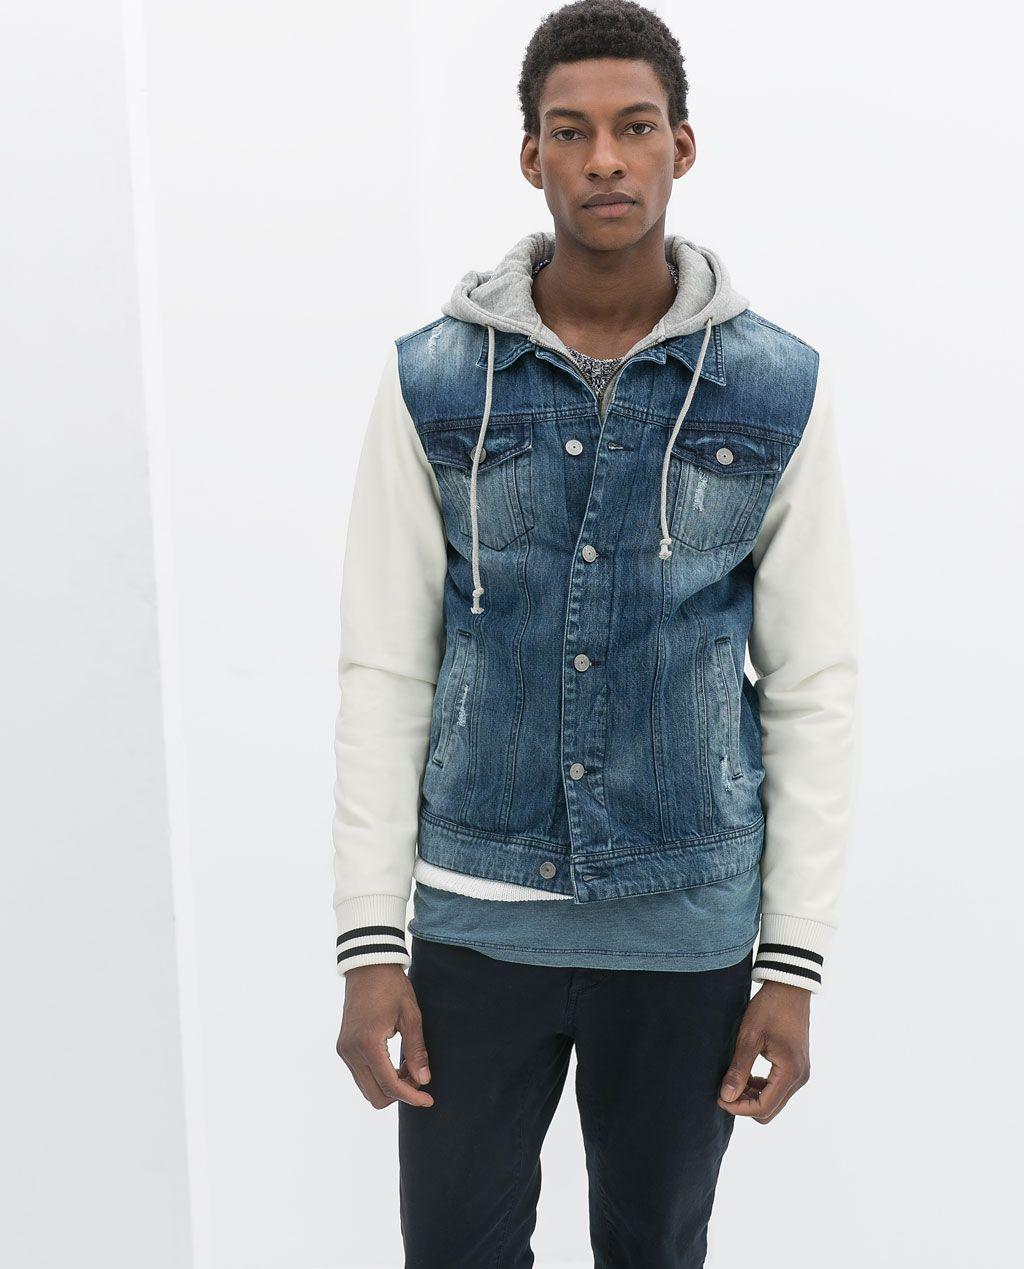 Zara Man Denim Jacket With Faux Leather Sleeves And Hood Denim Jacket Jackets Clothes [ 1269 x 1024 Pixel ]